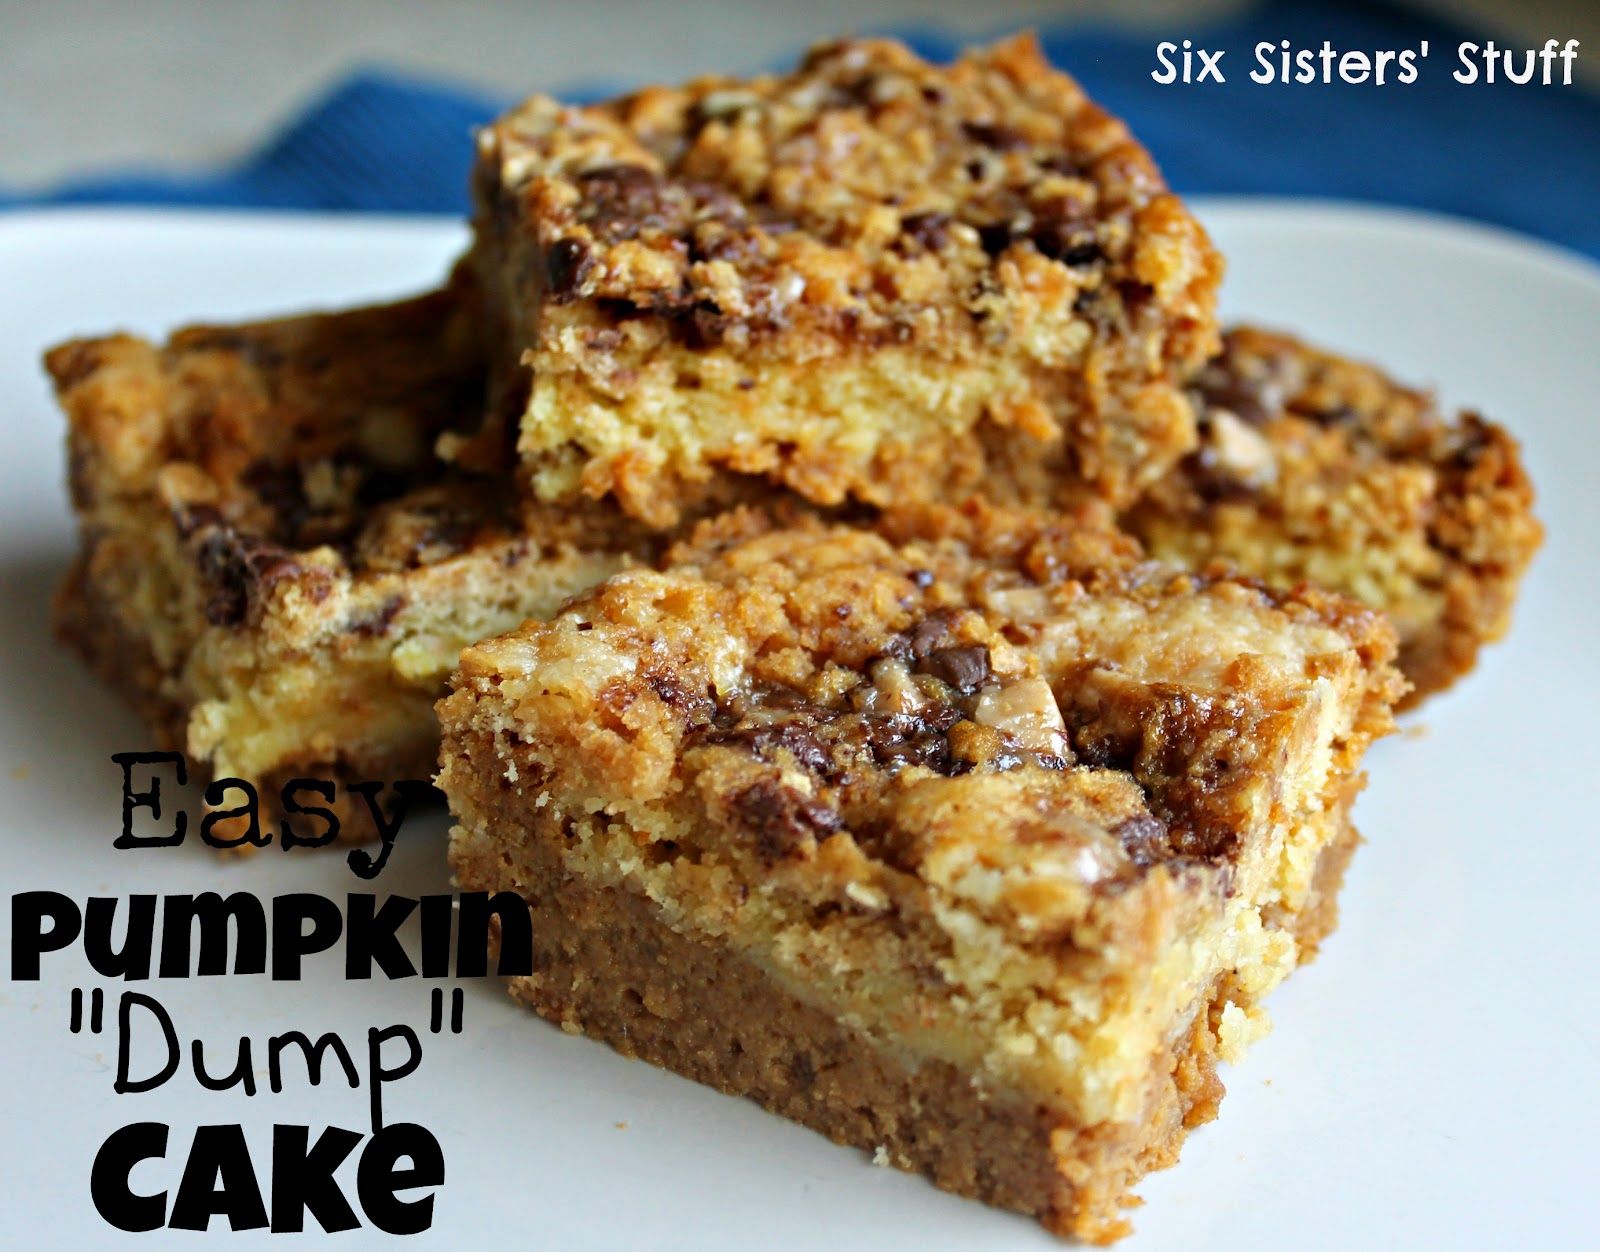 Pumpkin Dump Cake Using Spice Cake